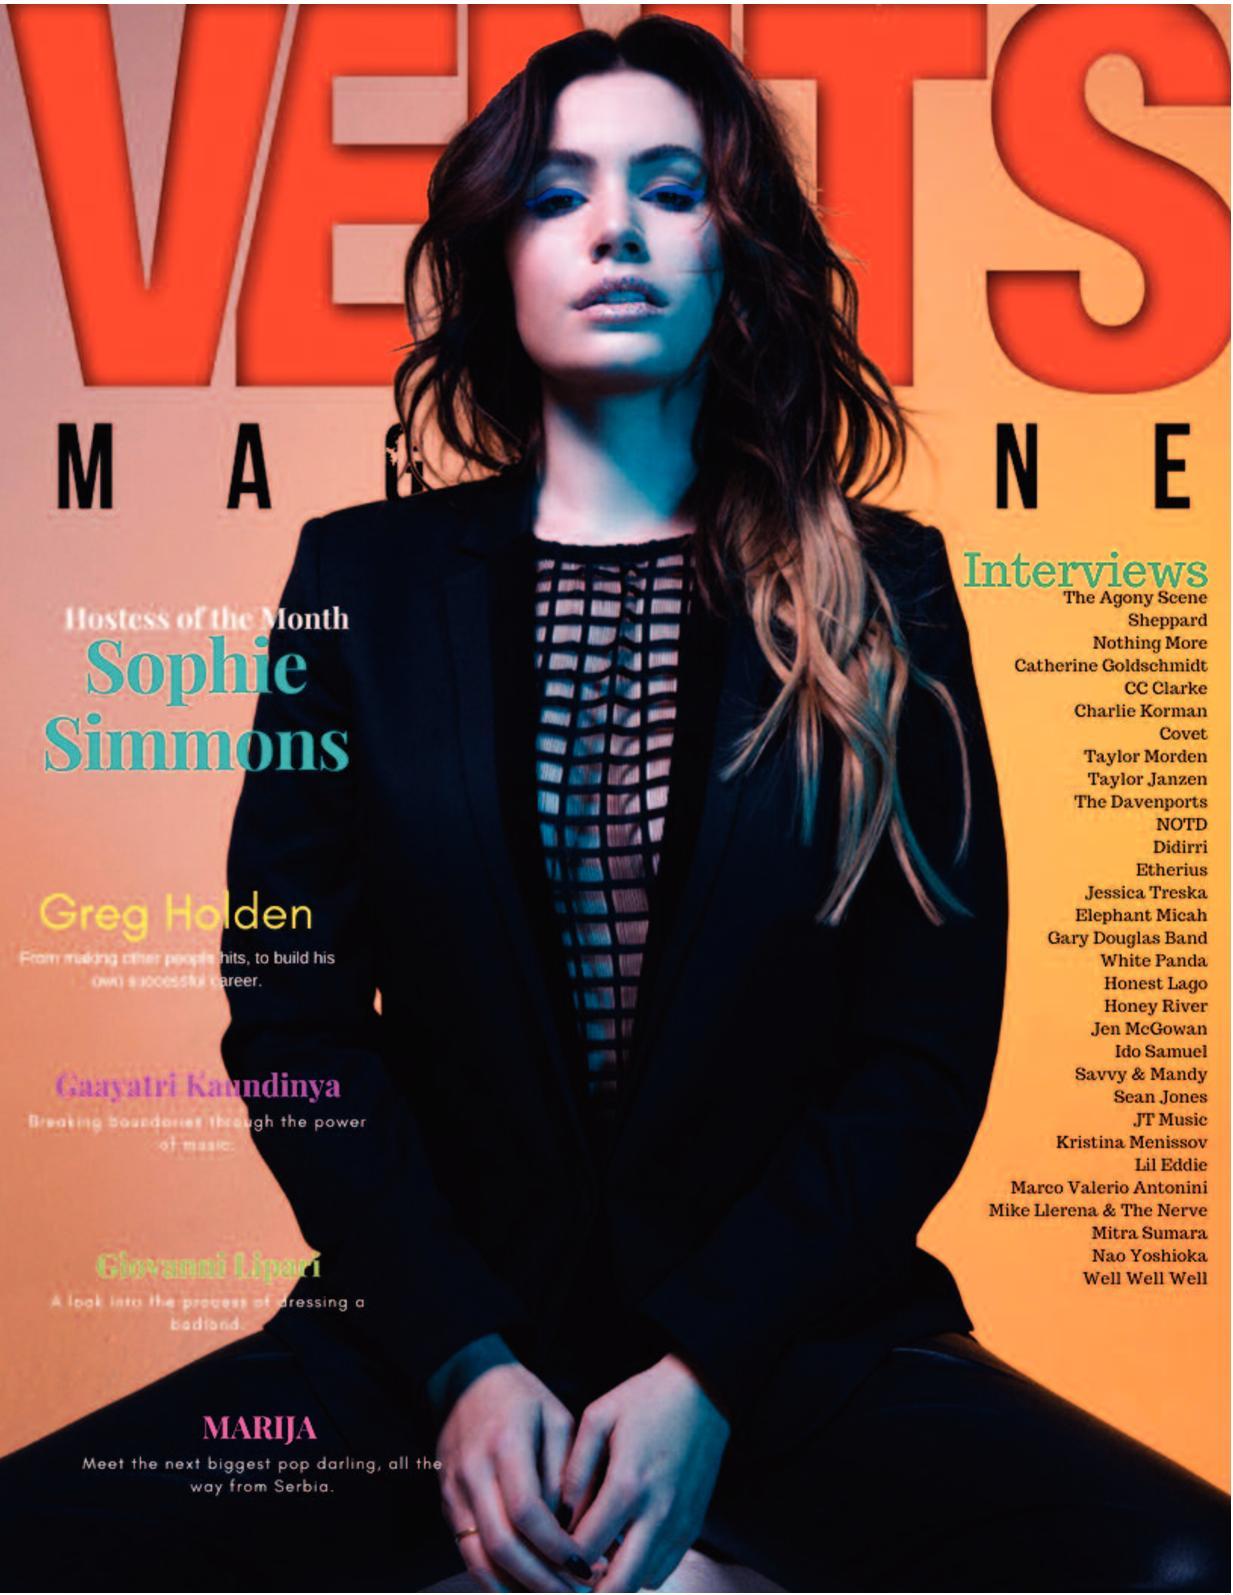 Calamo Vents Magazine 85th Issue